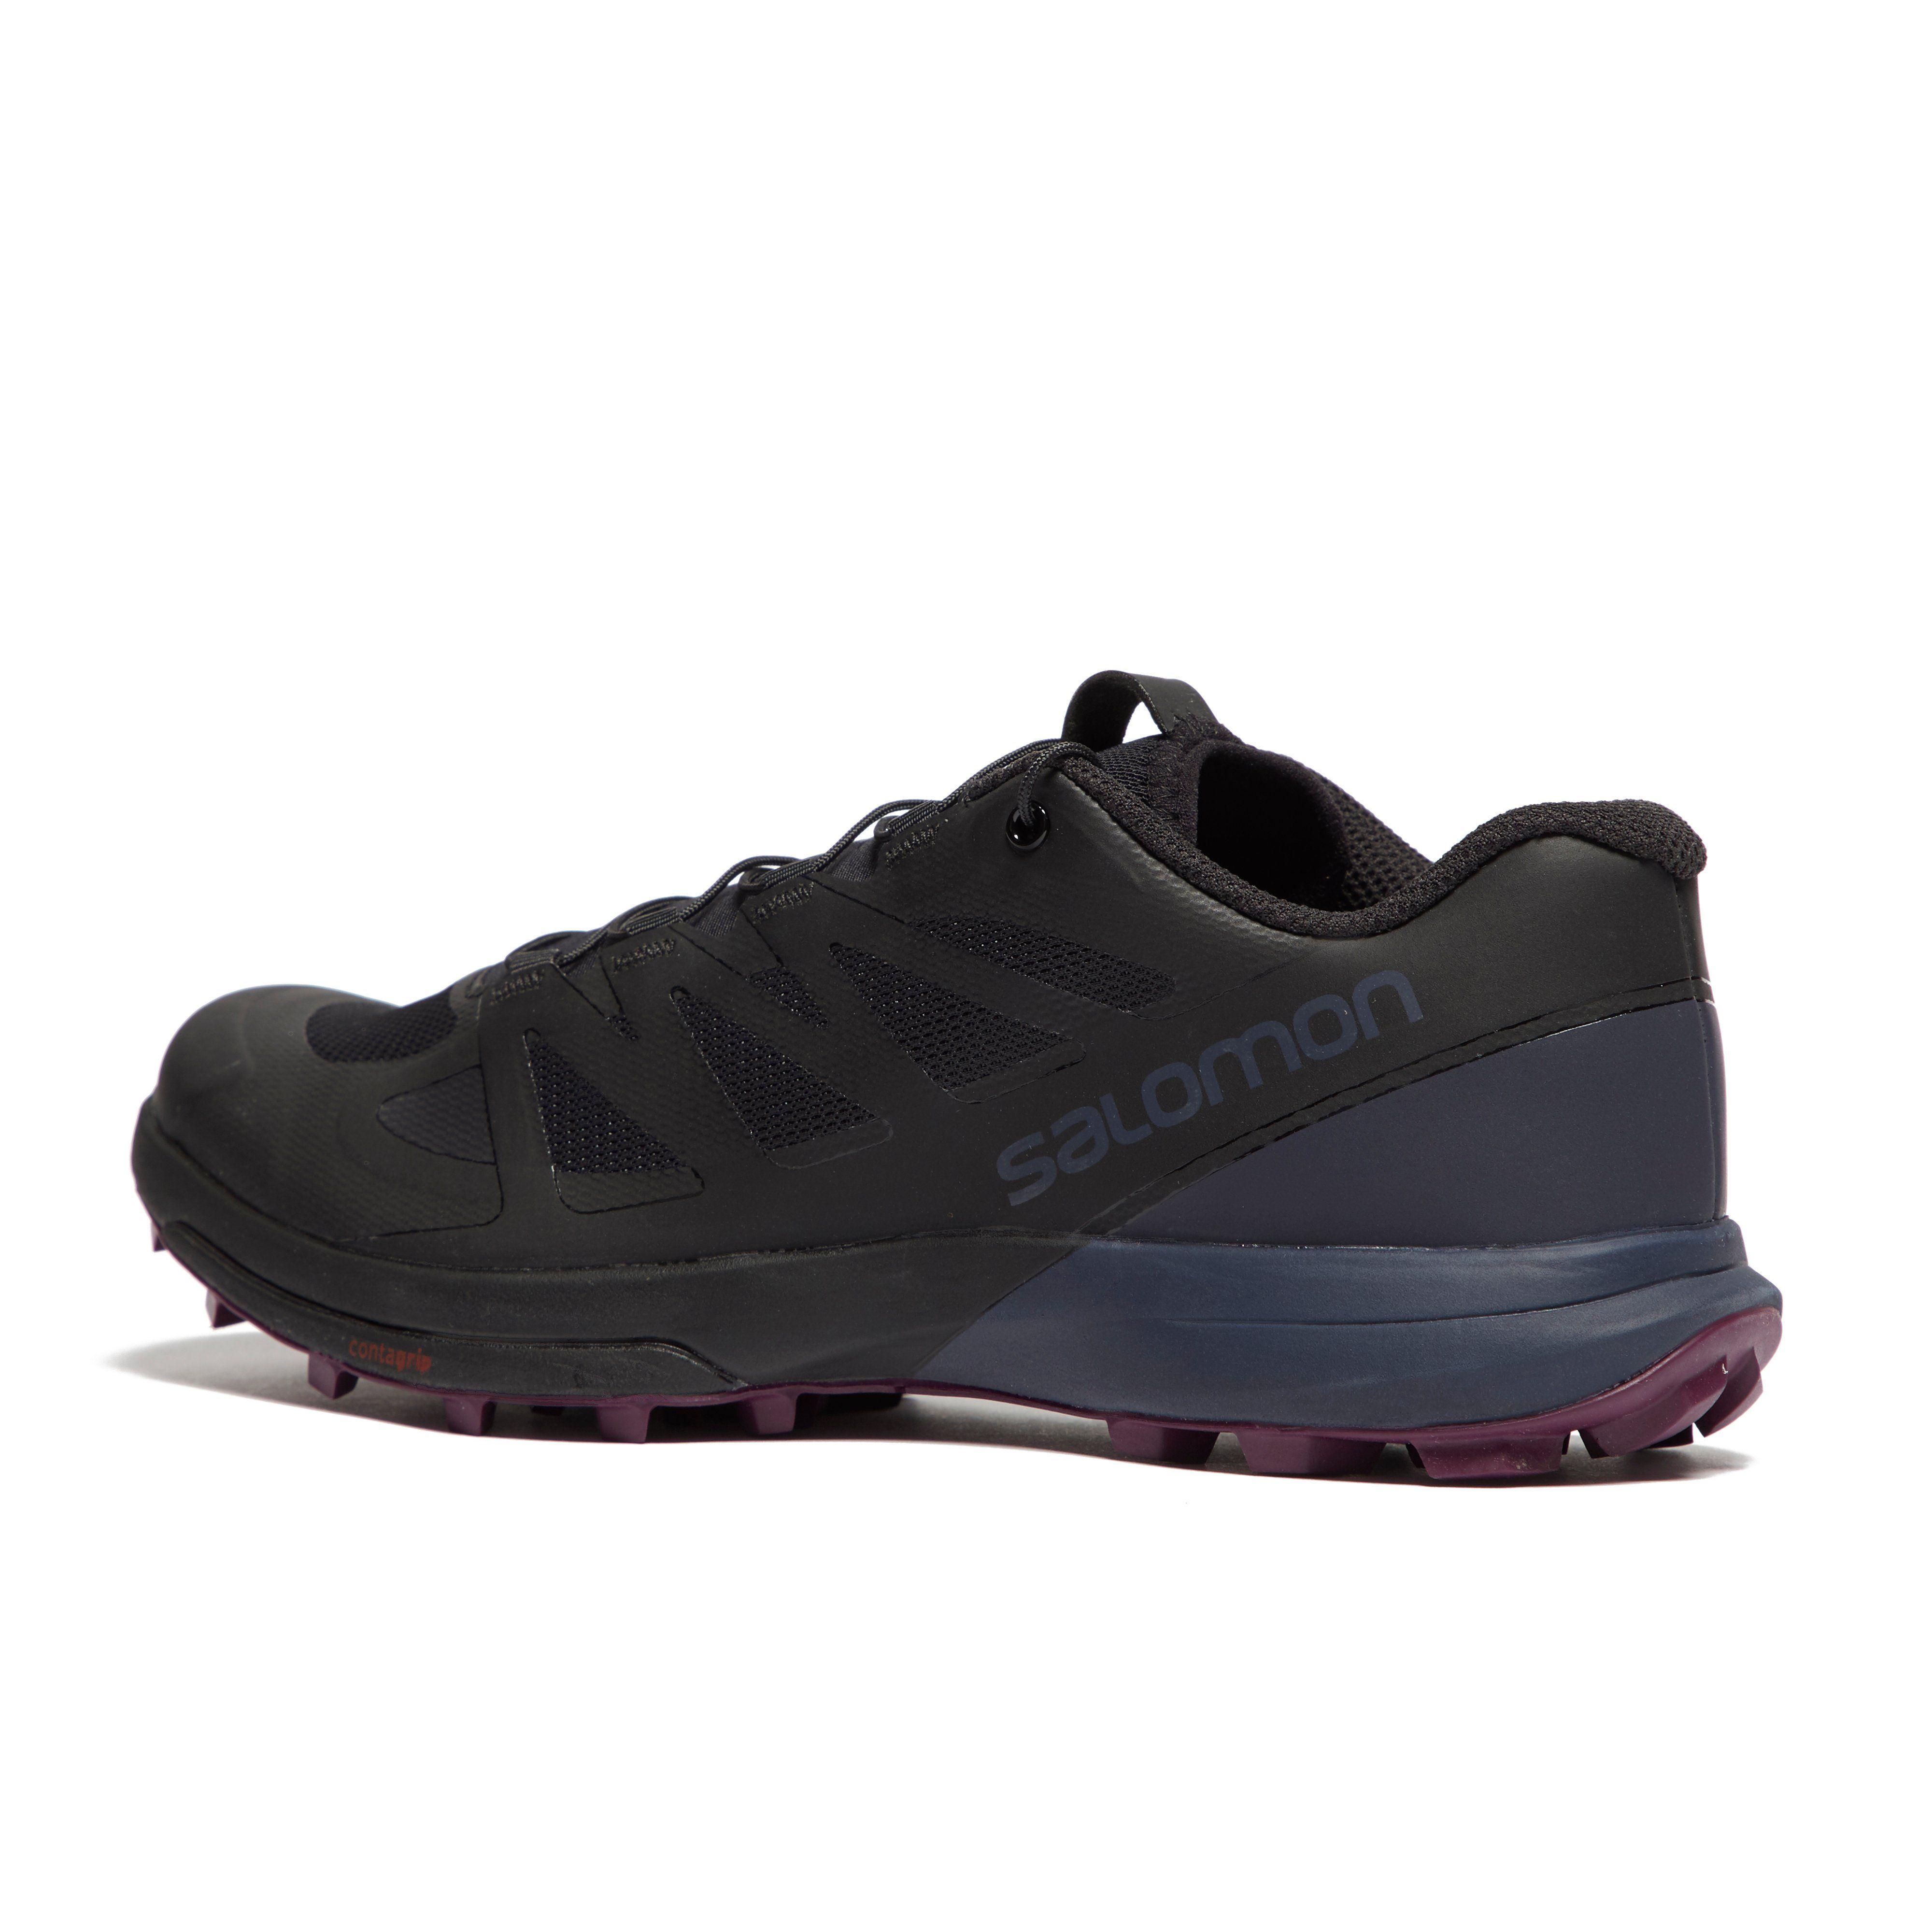 Salomon Sense Pro 3 Women's Trail Running Shoes